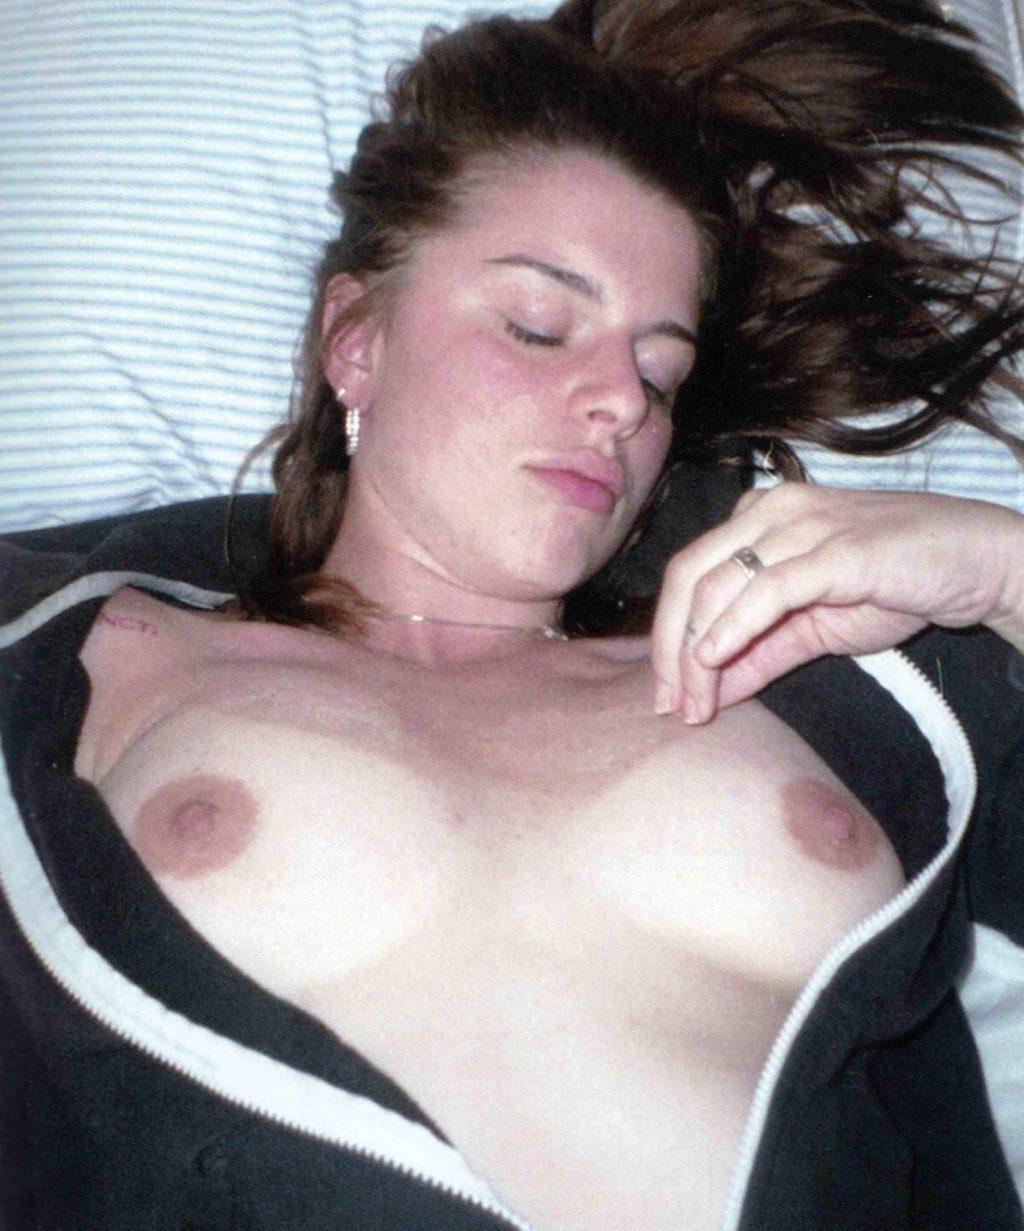 Julia Fox Nude – Heartburn/Nausea (25 Photos)